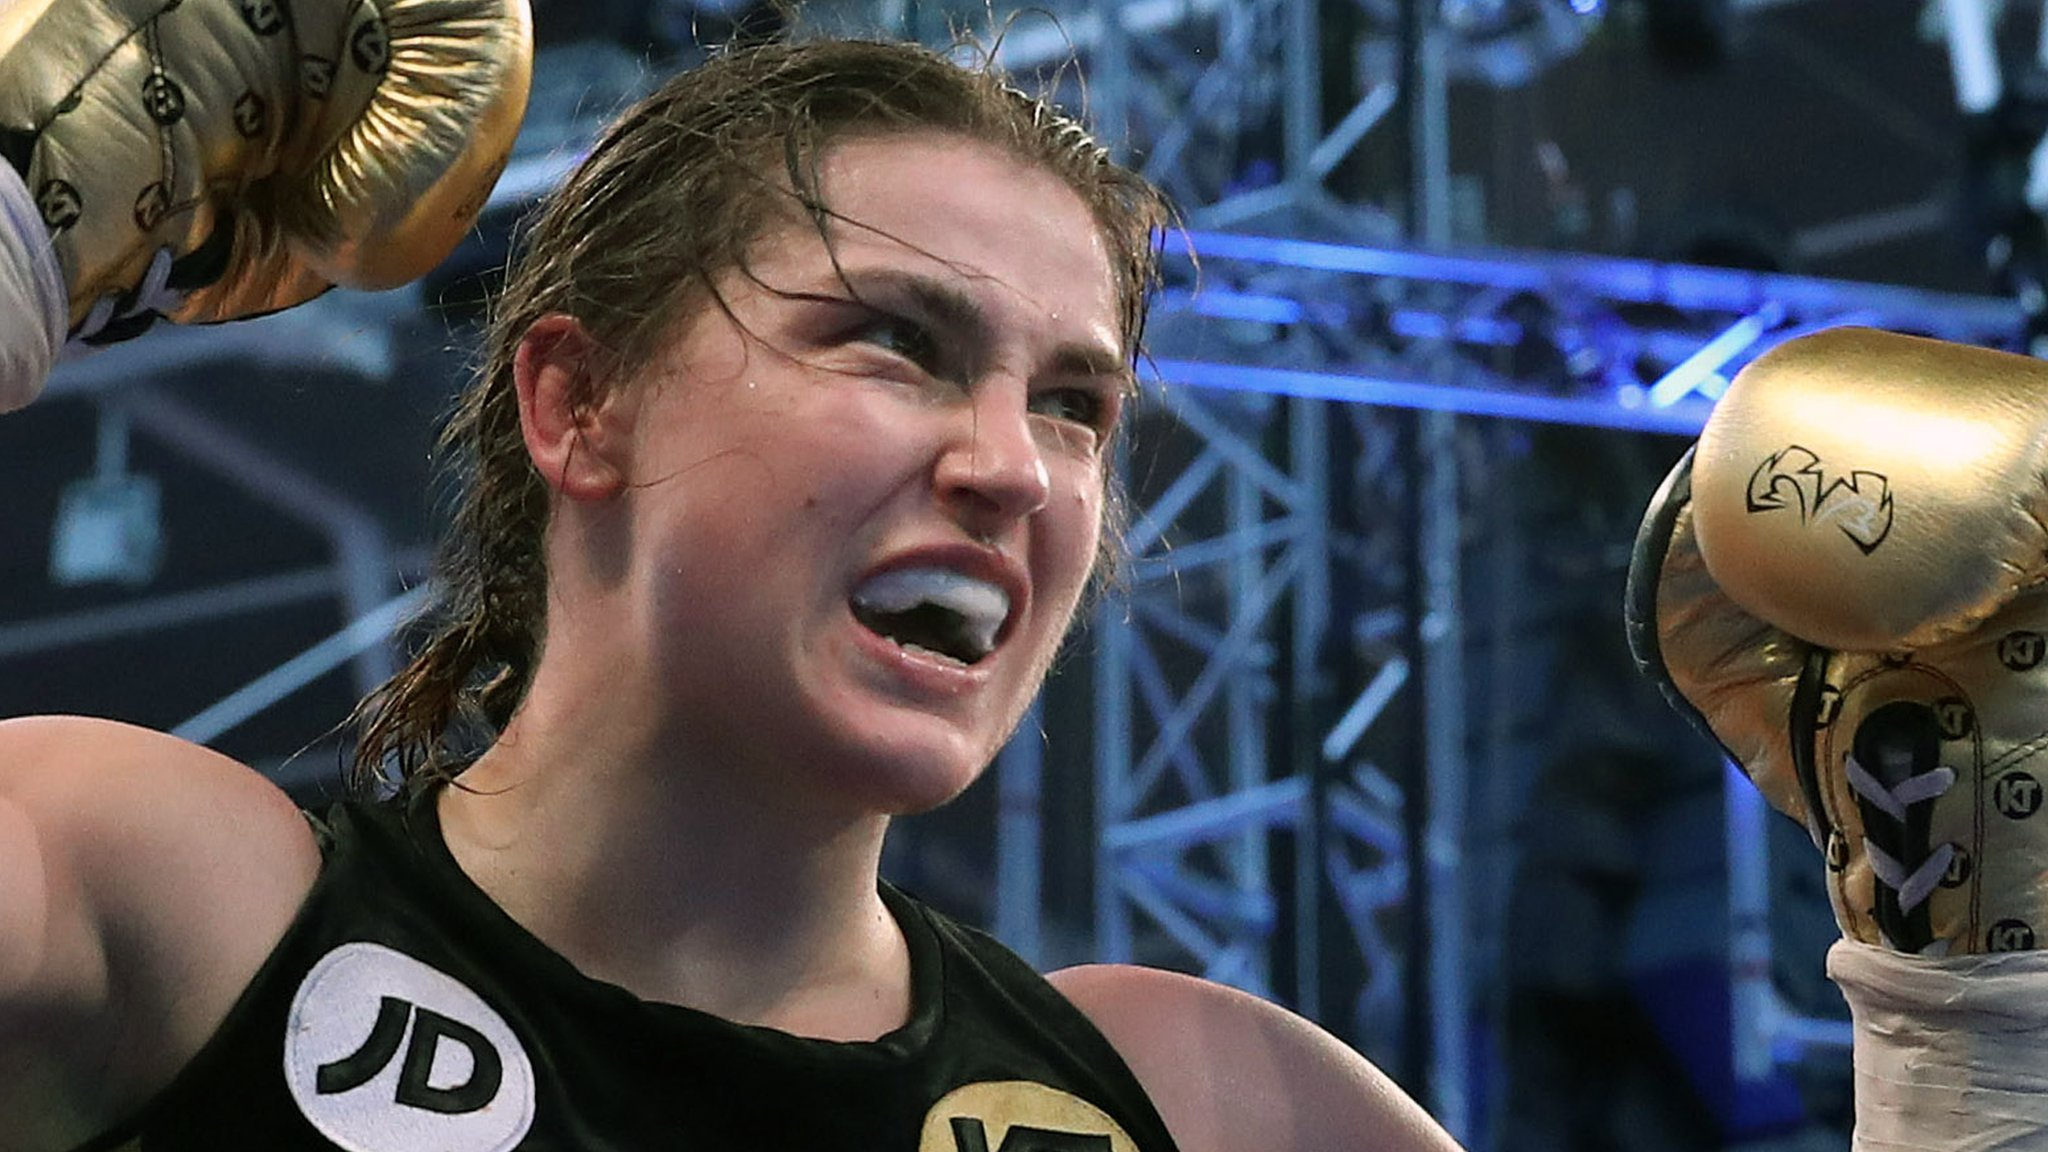 Ireland's Taylor beats Meinke to earn shot at world title